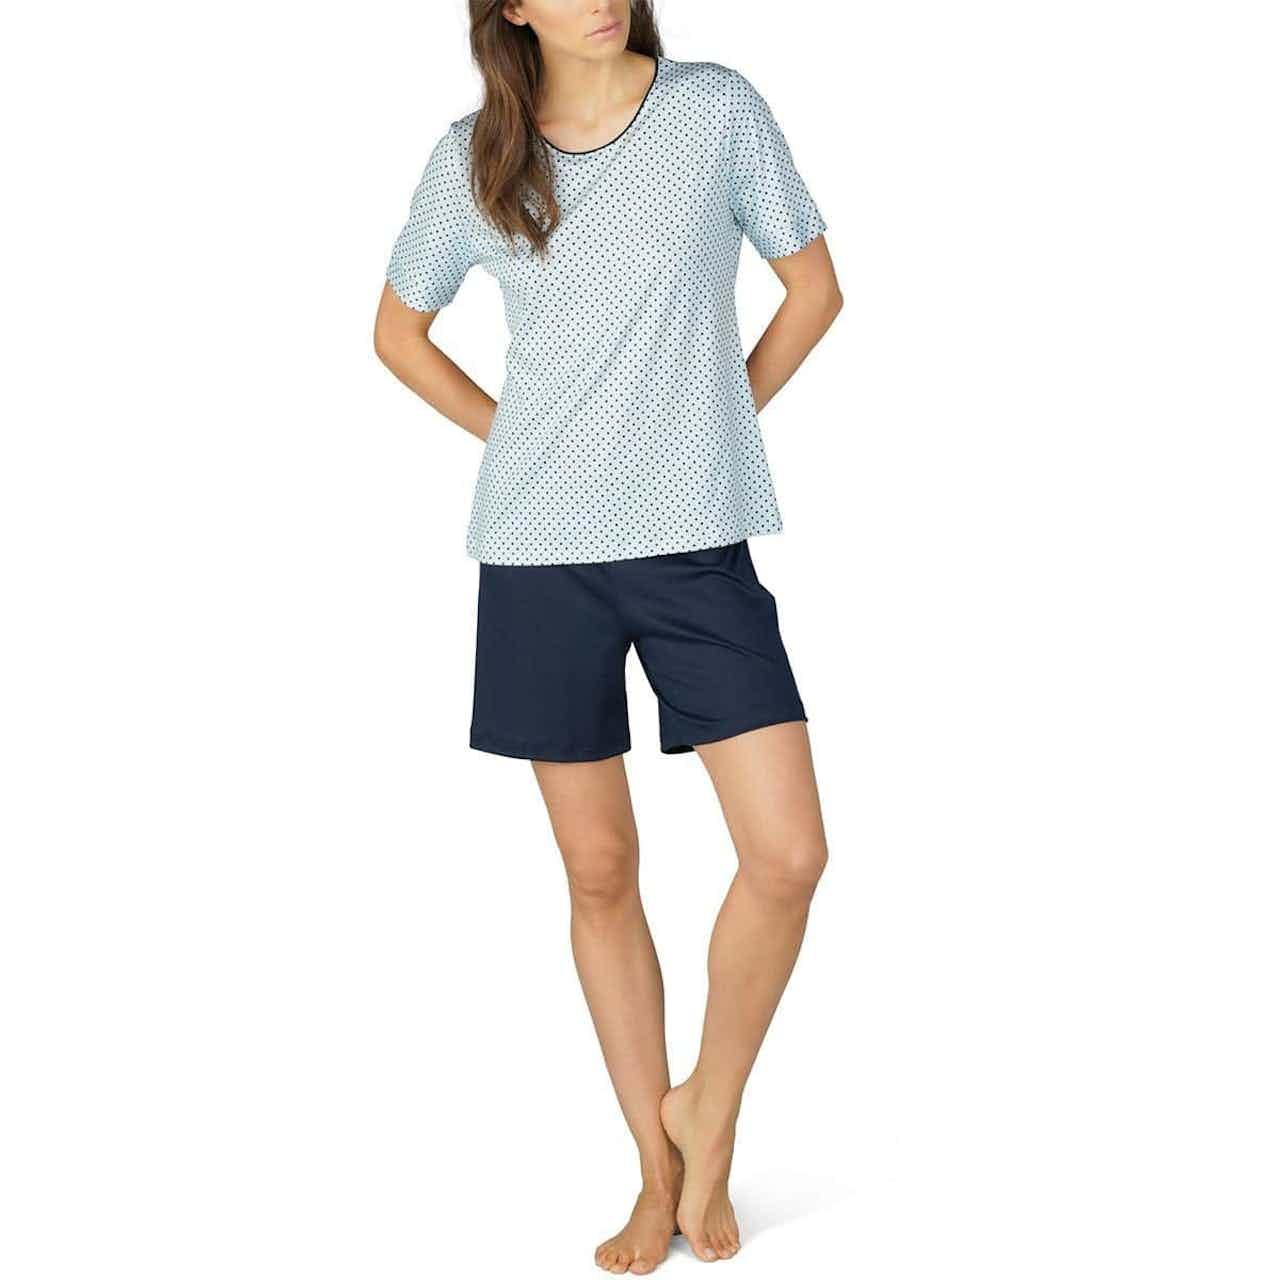 mey Damen Schlafanzug Sonja kurz night blue